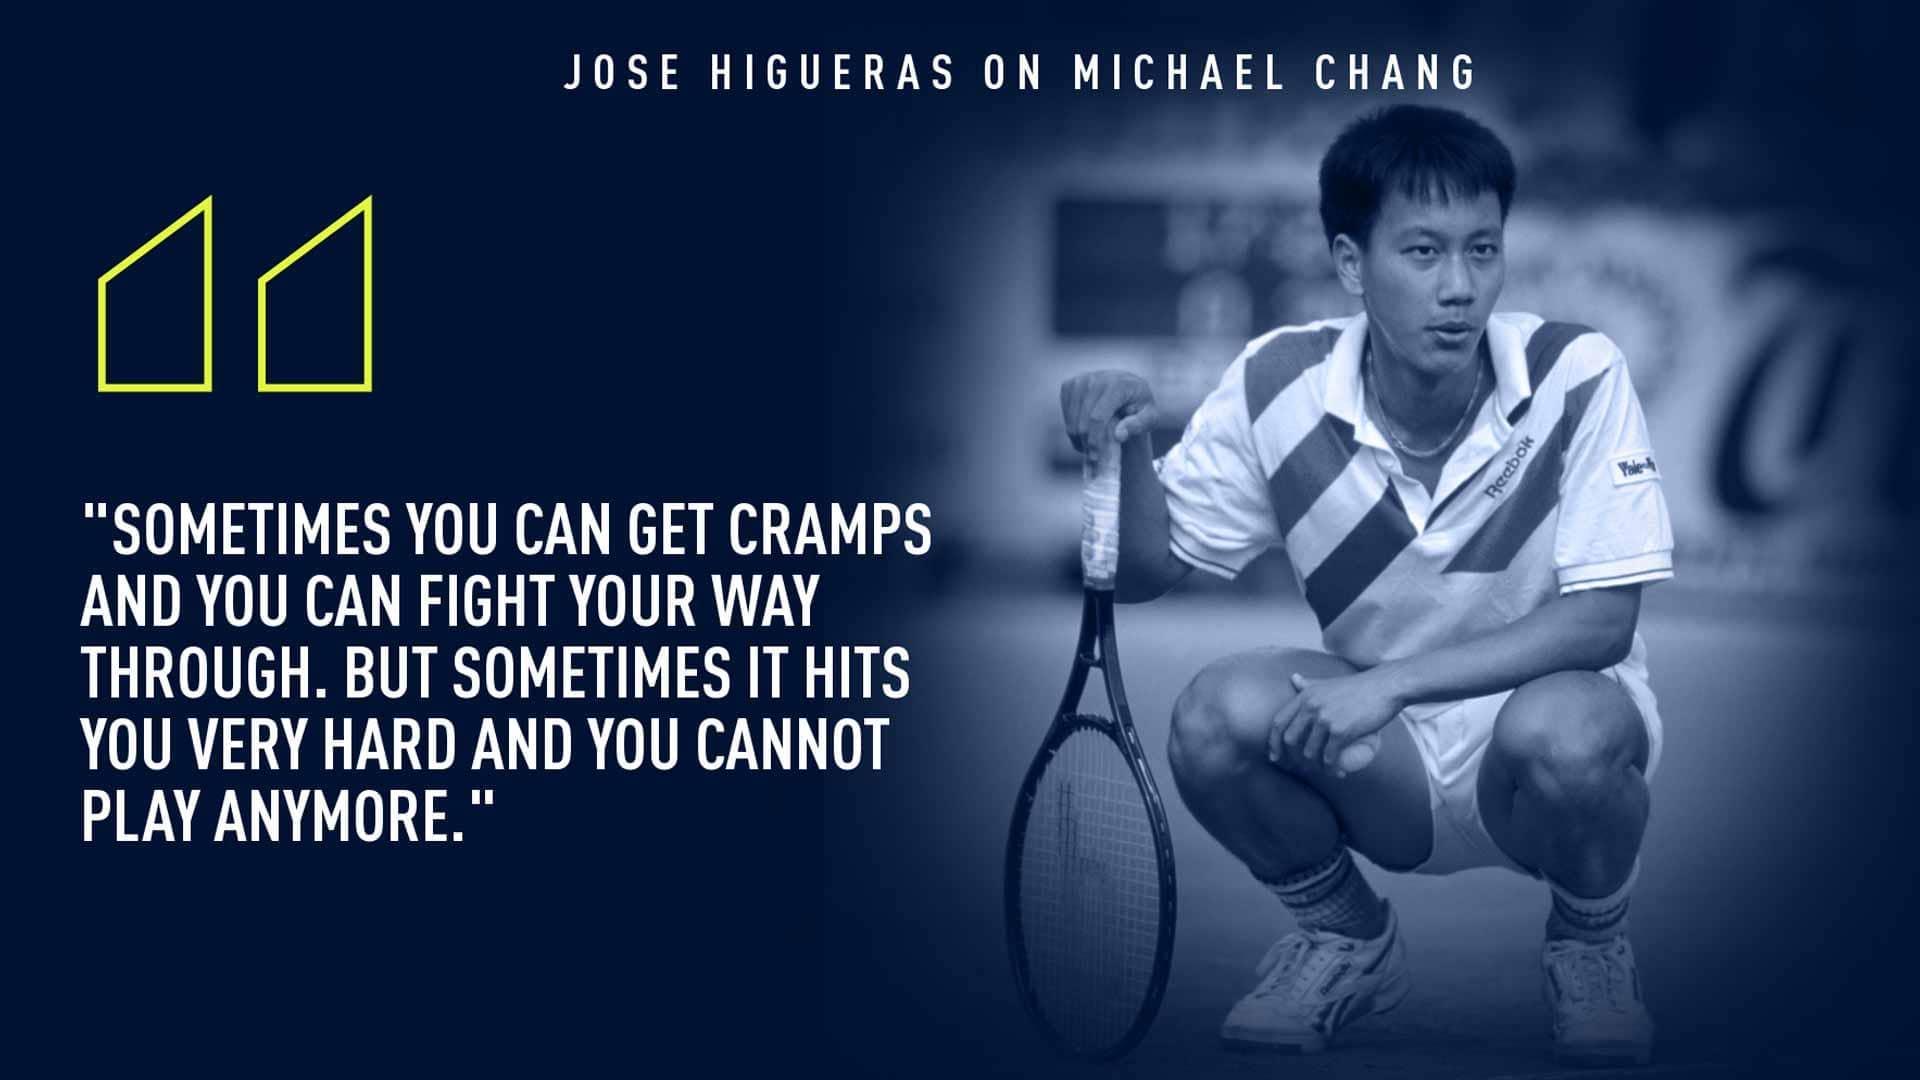 Jose Higueras on Michael Chang